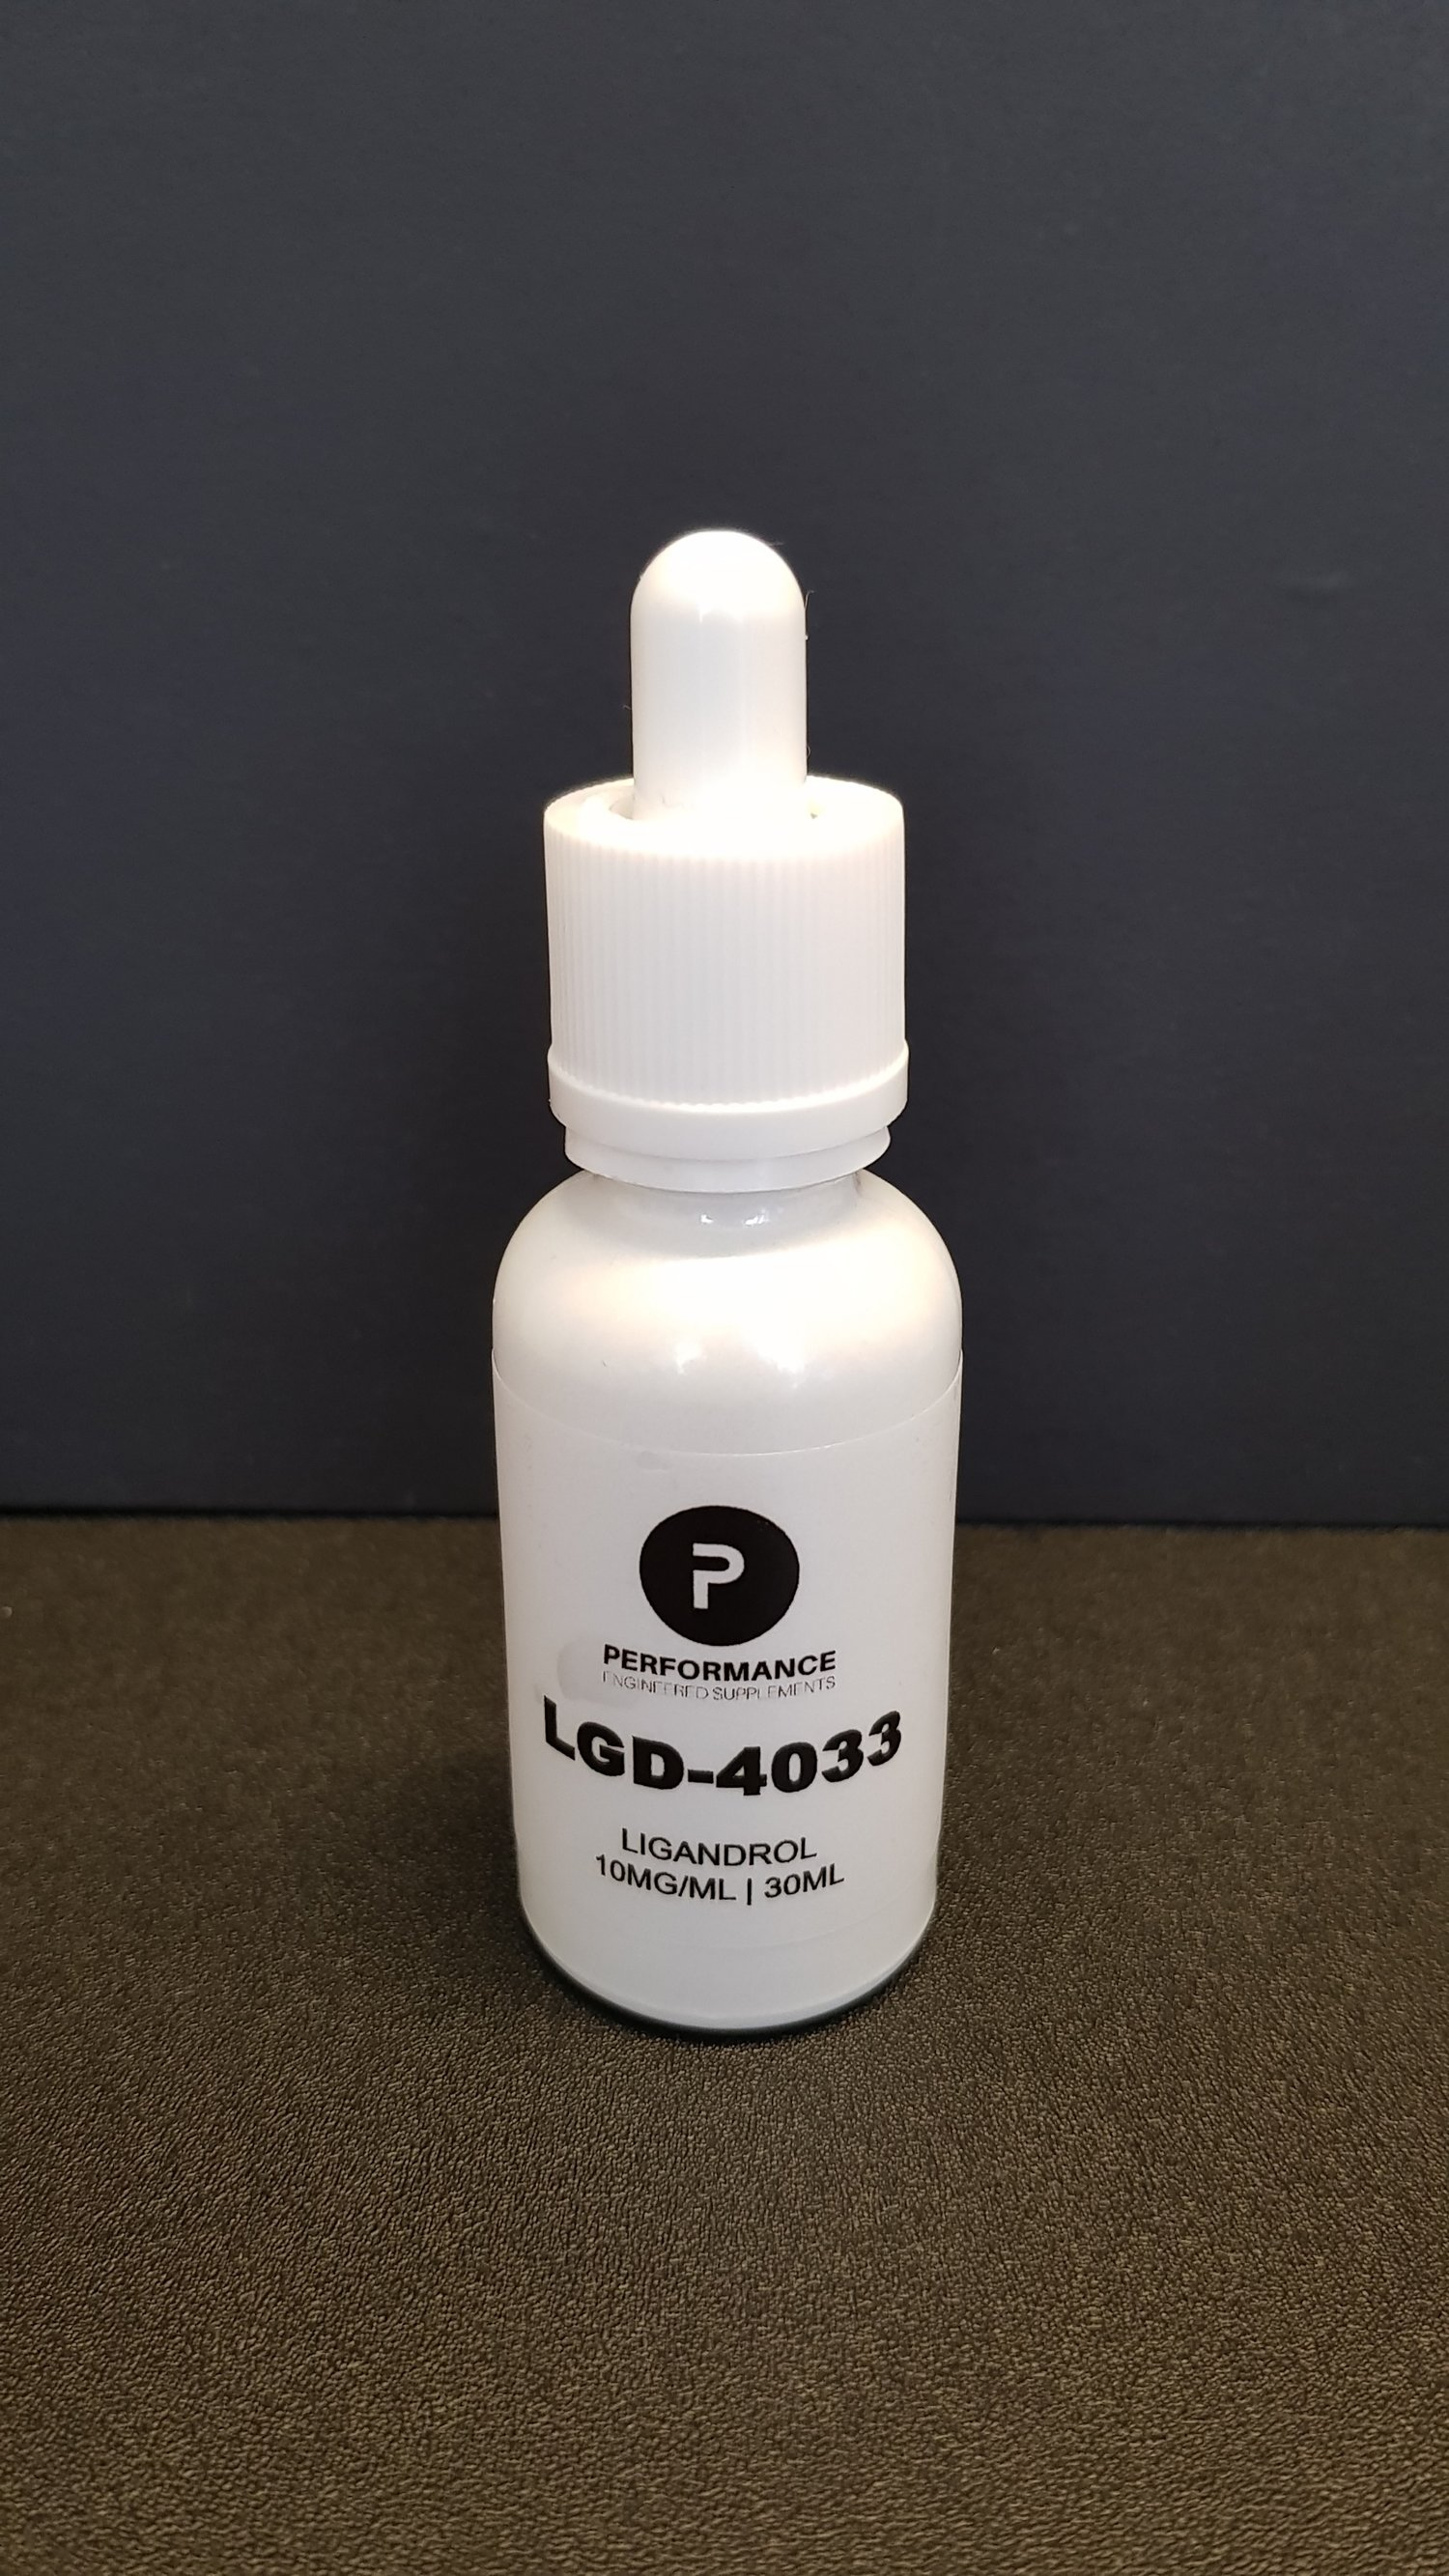 LGD-4033 (Ligandrol) – 10mg/ml | (30ml) — Performance Engineered Supplements